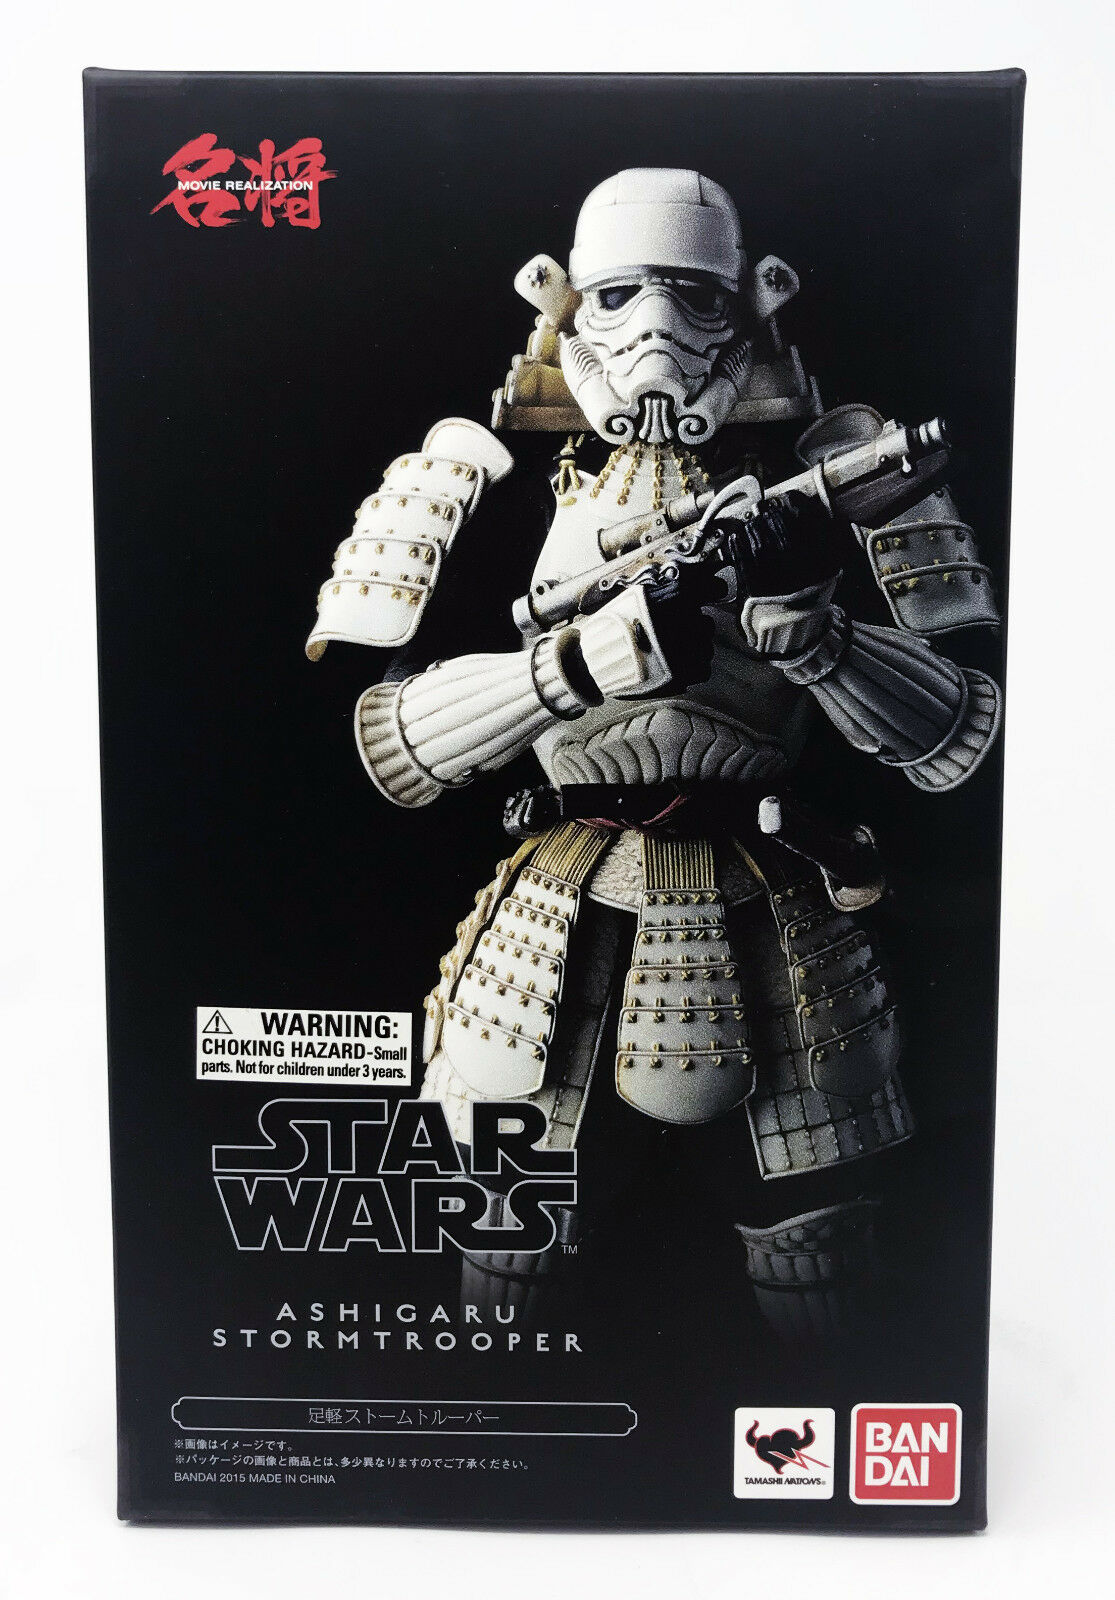 Tamashii Movie Realization Ashigaru pied Soldat Stormtrooper Star Wars neuf en boîte scellée